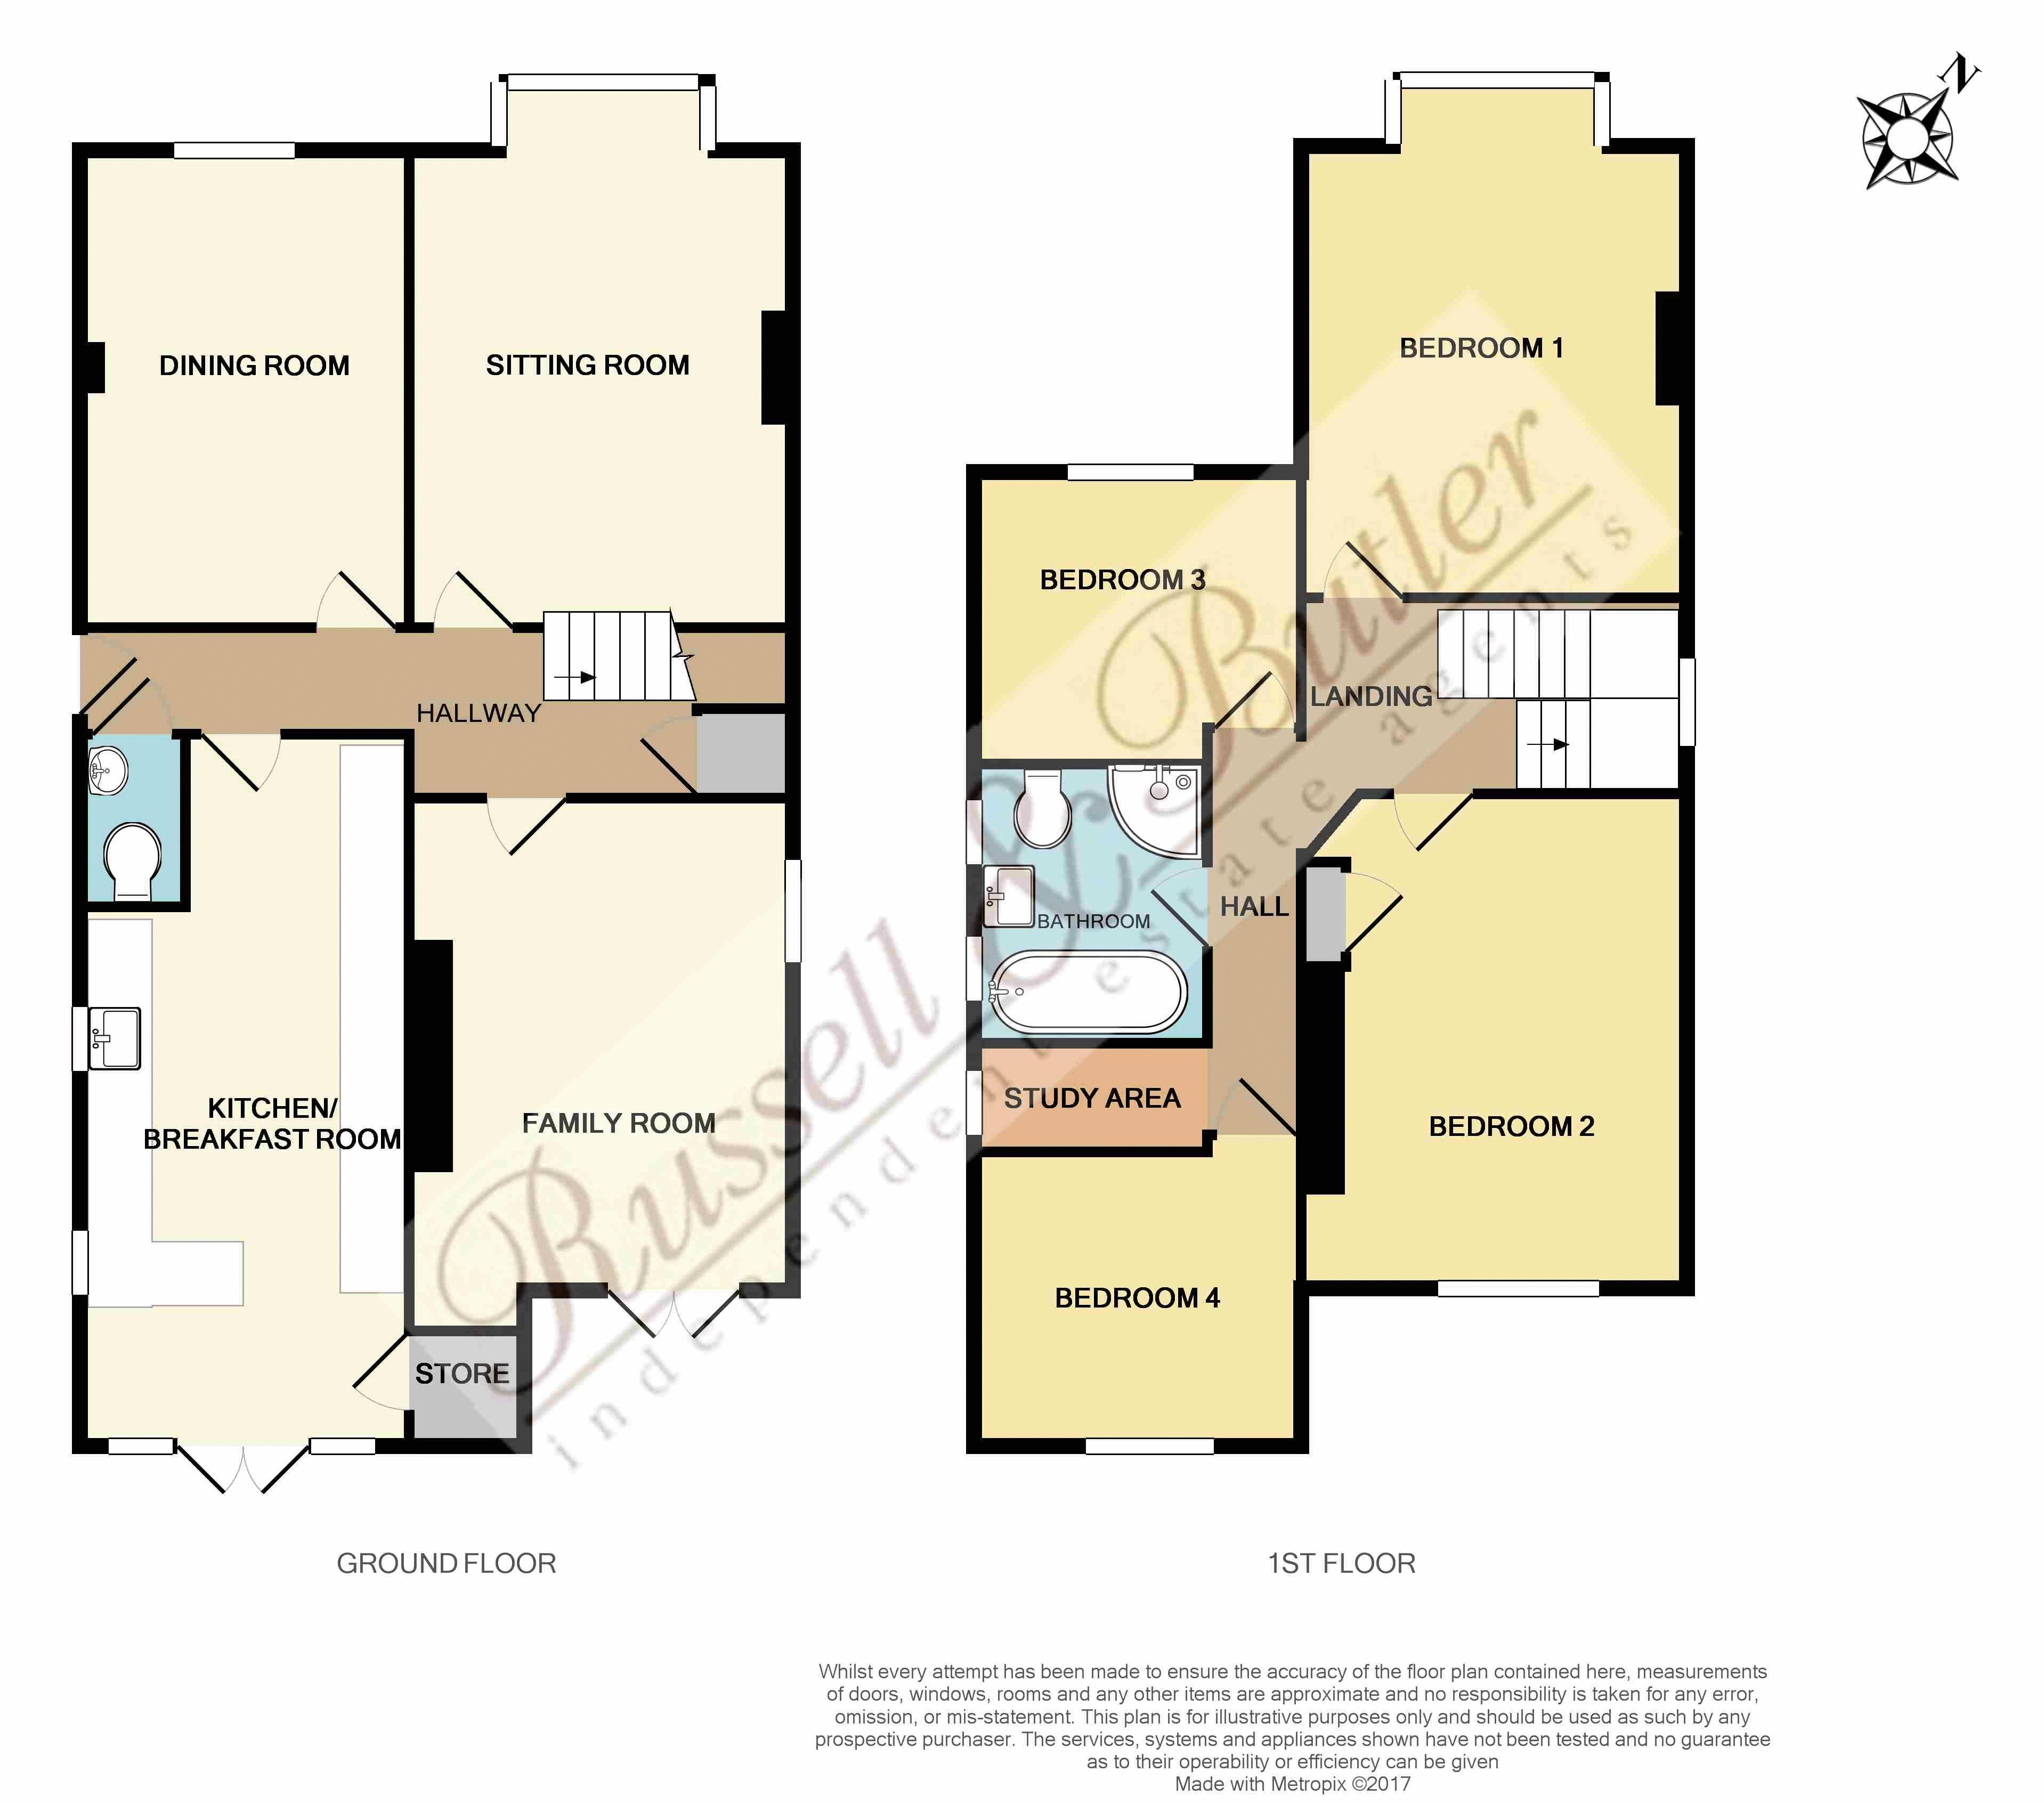 london road buckingham mk18 4 bedroom detached house for sale